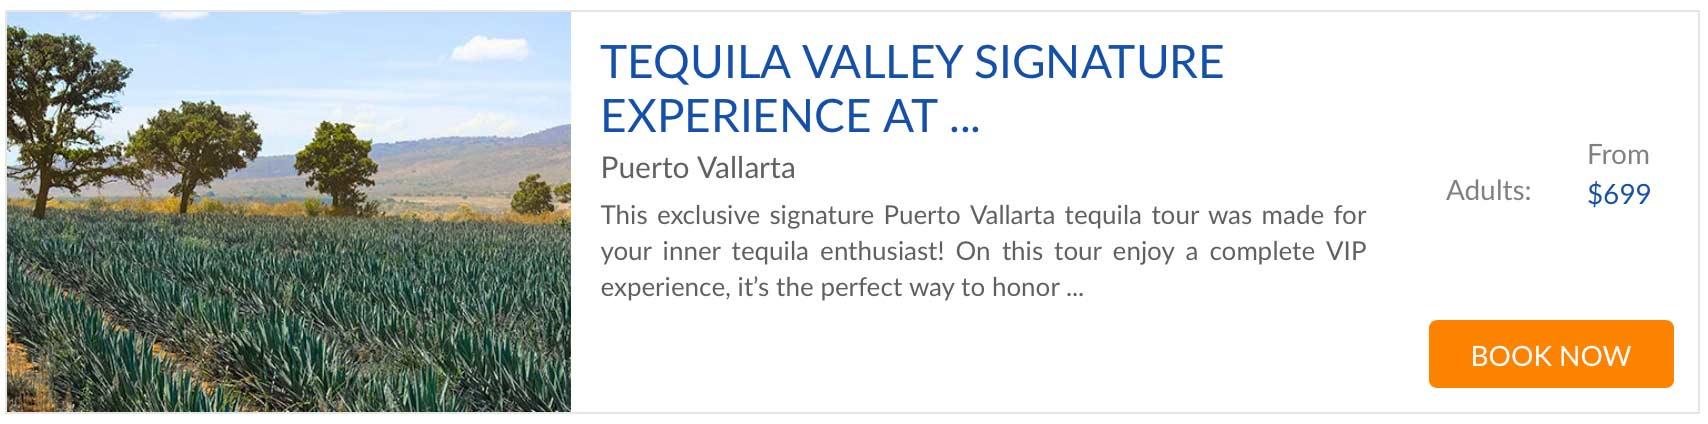 signature experience vallarta